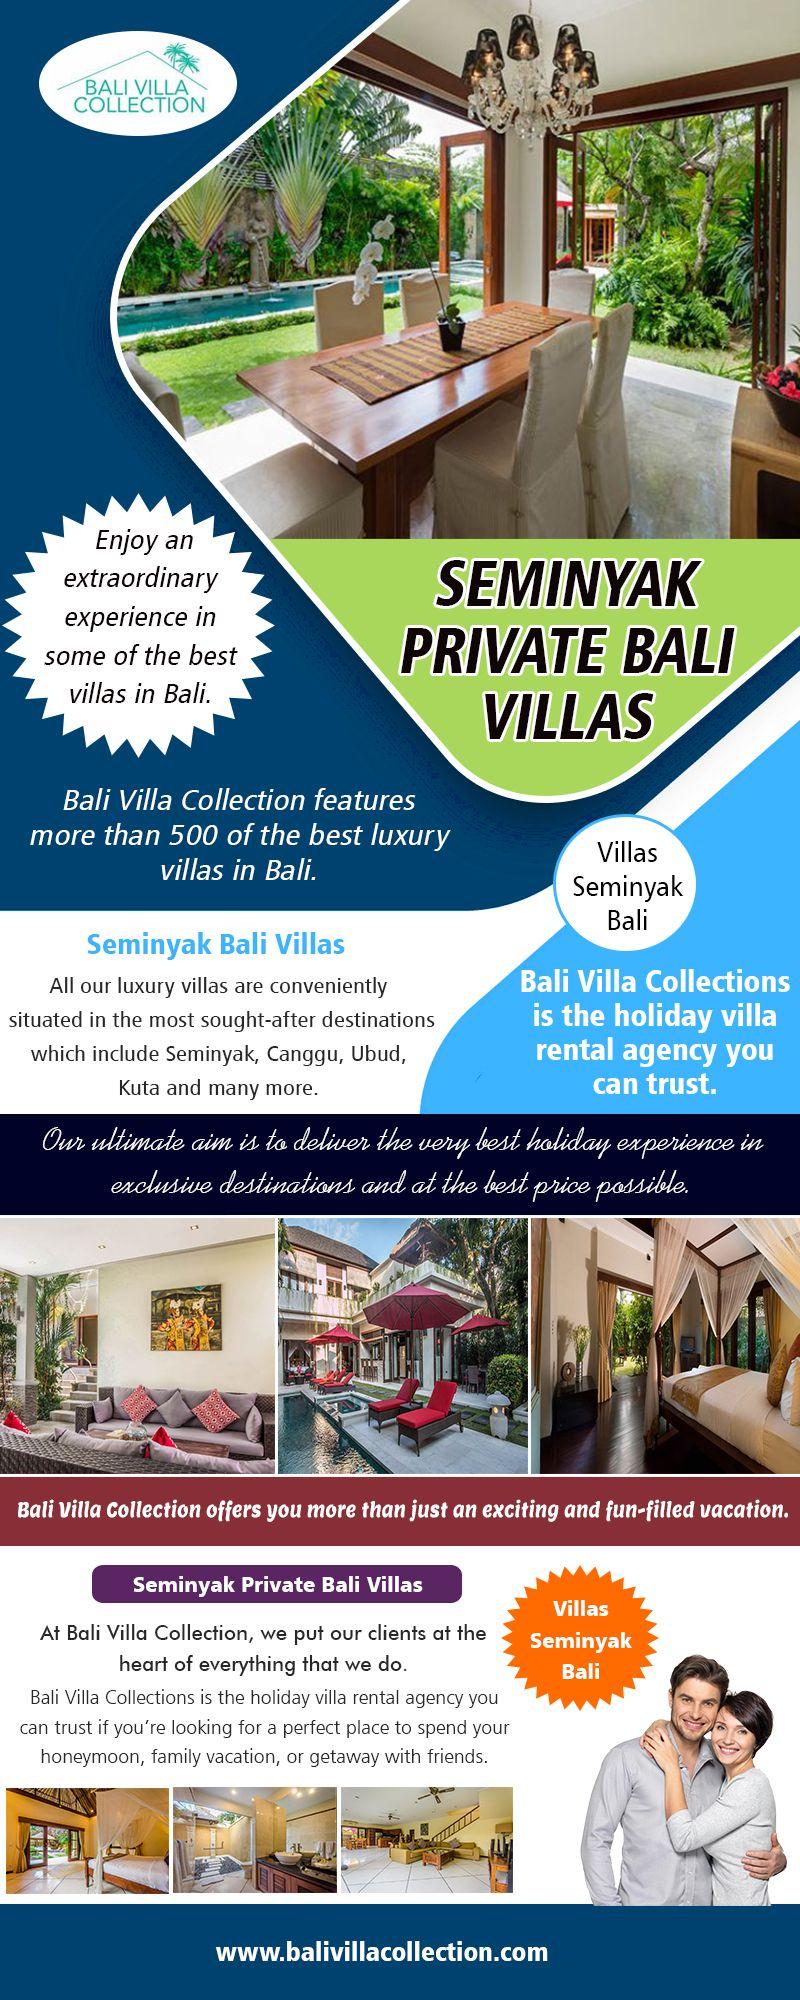 Seminyak Private Bali Villas Bali Luxury Villas Luxury Villa Villa